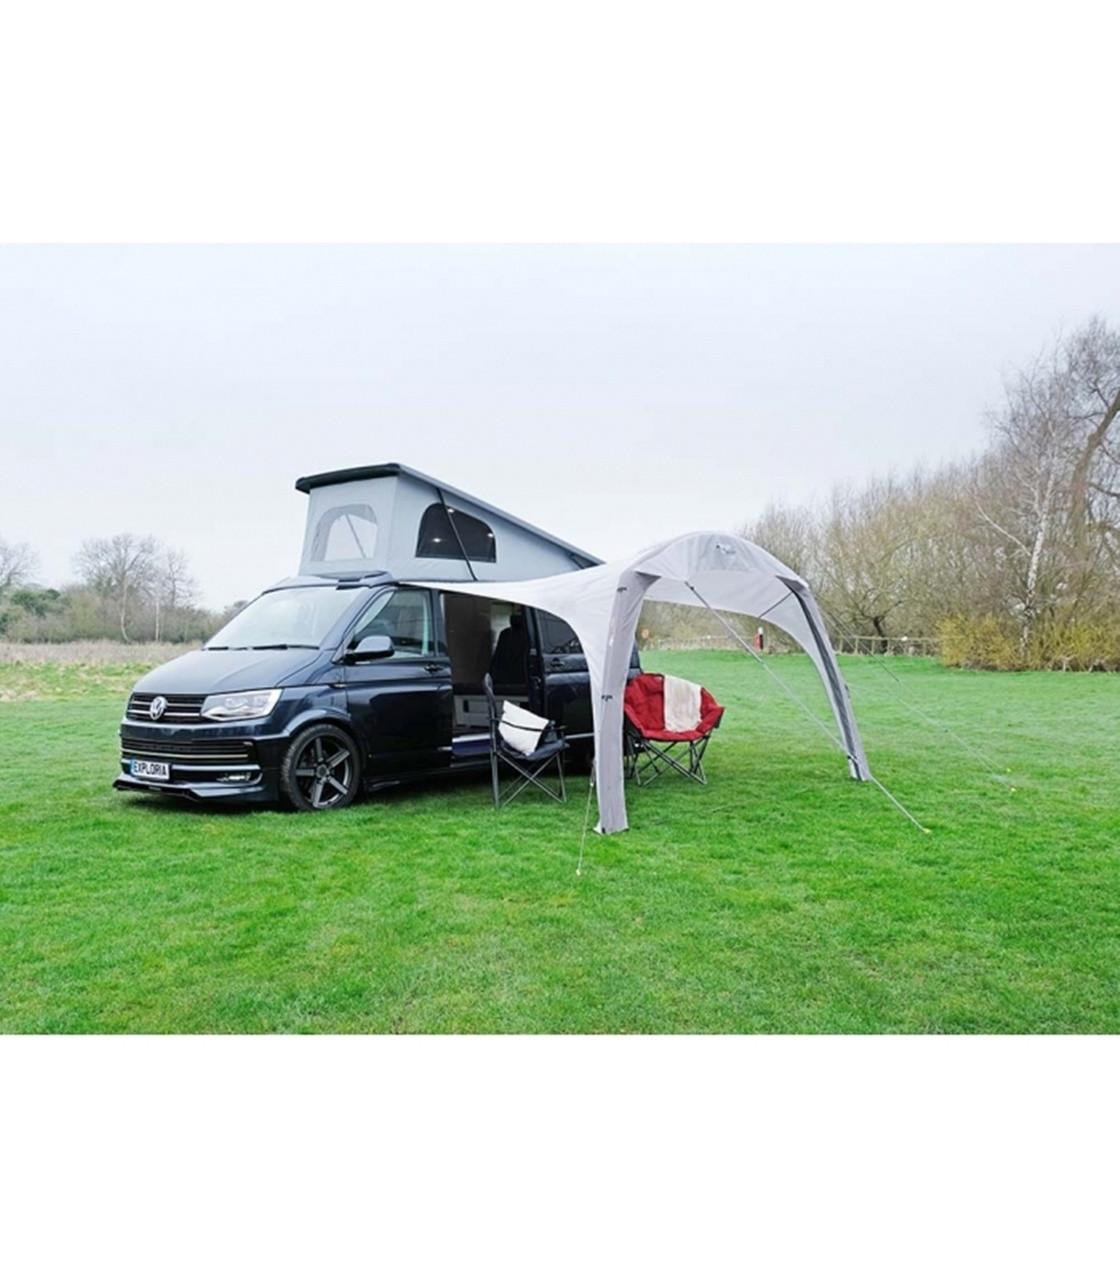 ... Vango AirBeam Sun Canopy for Caravan u0026 Motorhomes ...  sc 1 st  driveaway-awnings.co.uk & Vango AirBeam Sun Canopy for Caravan u0026 Motorhomes 3M - driveaway ...